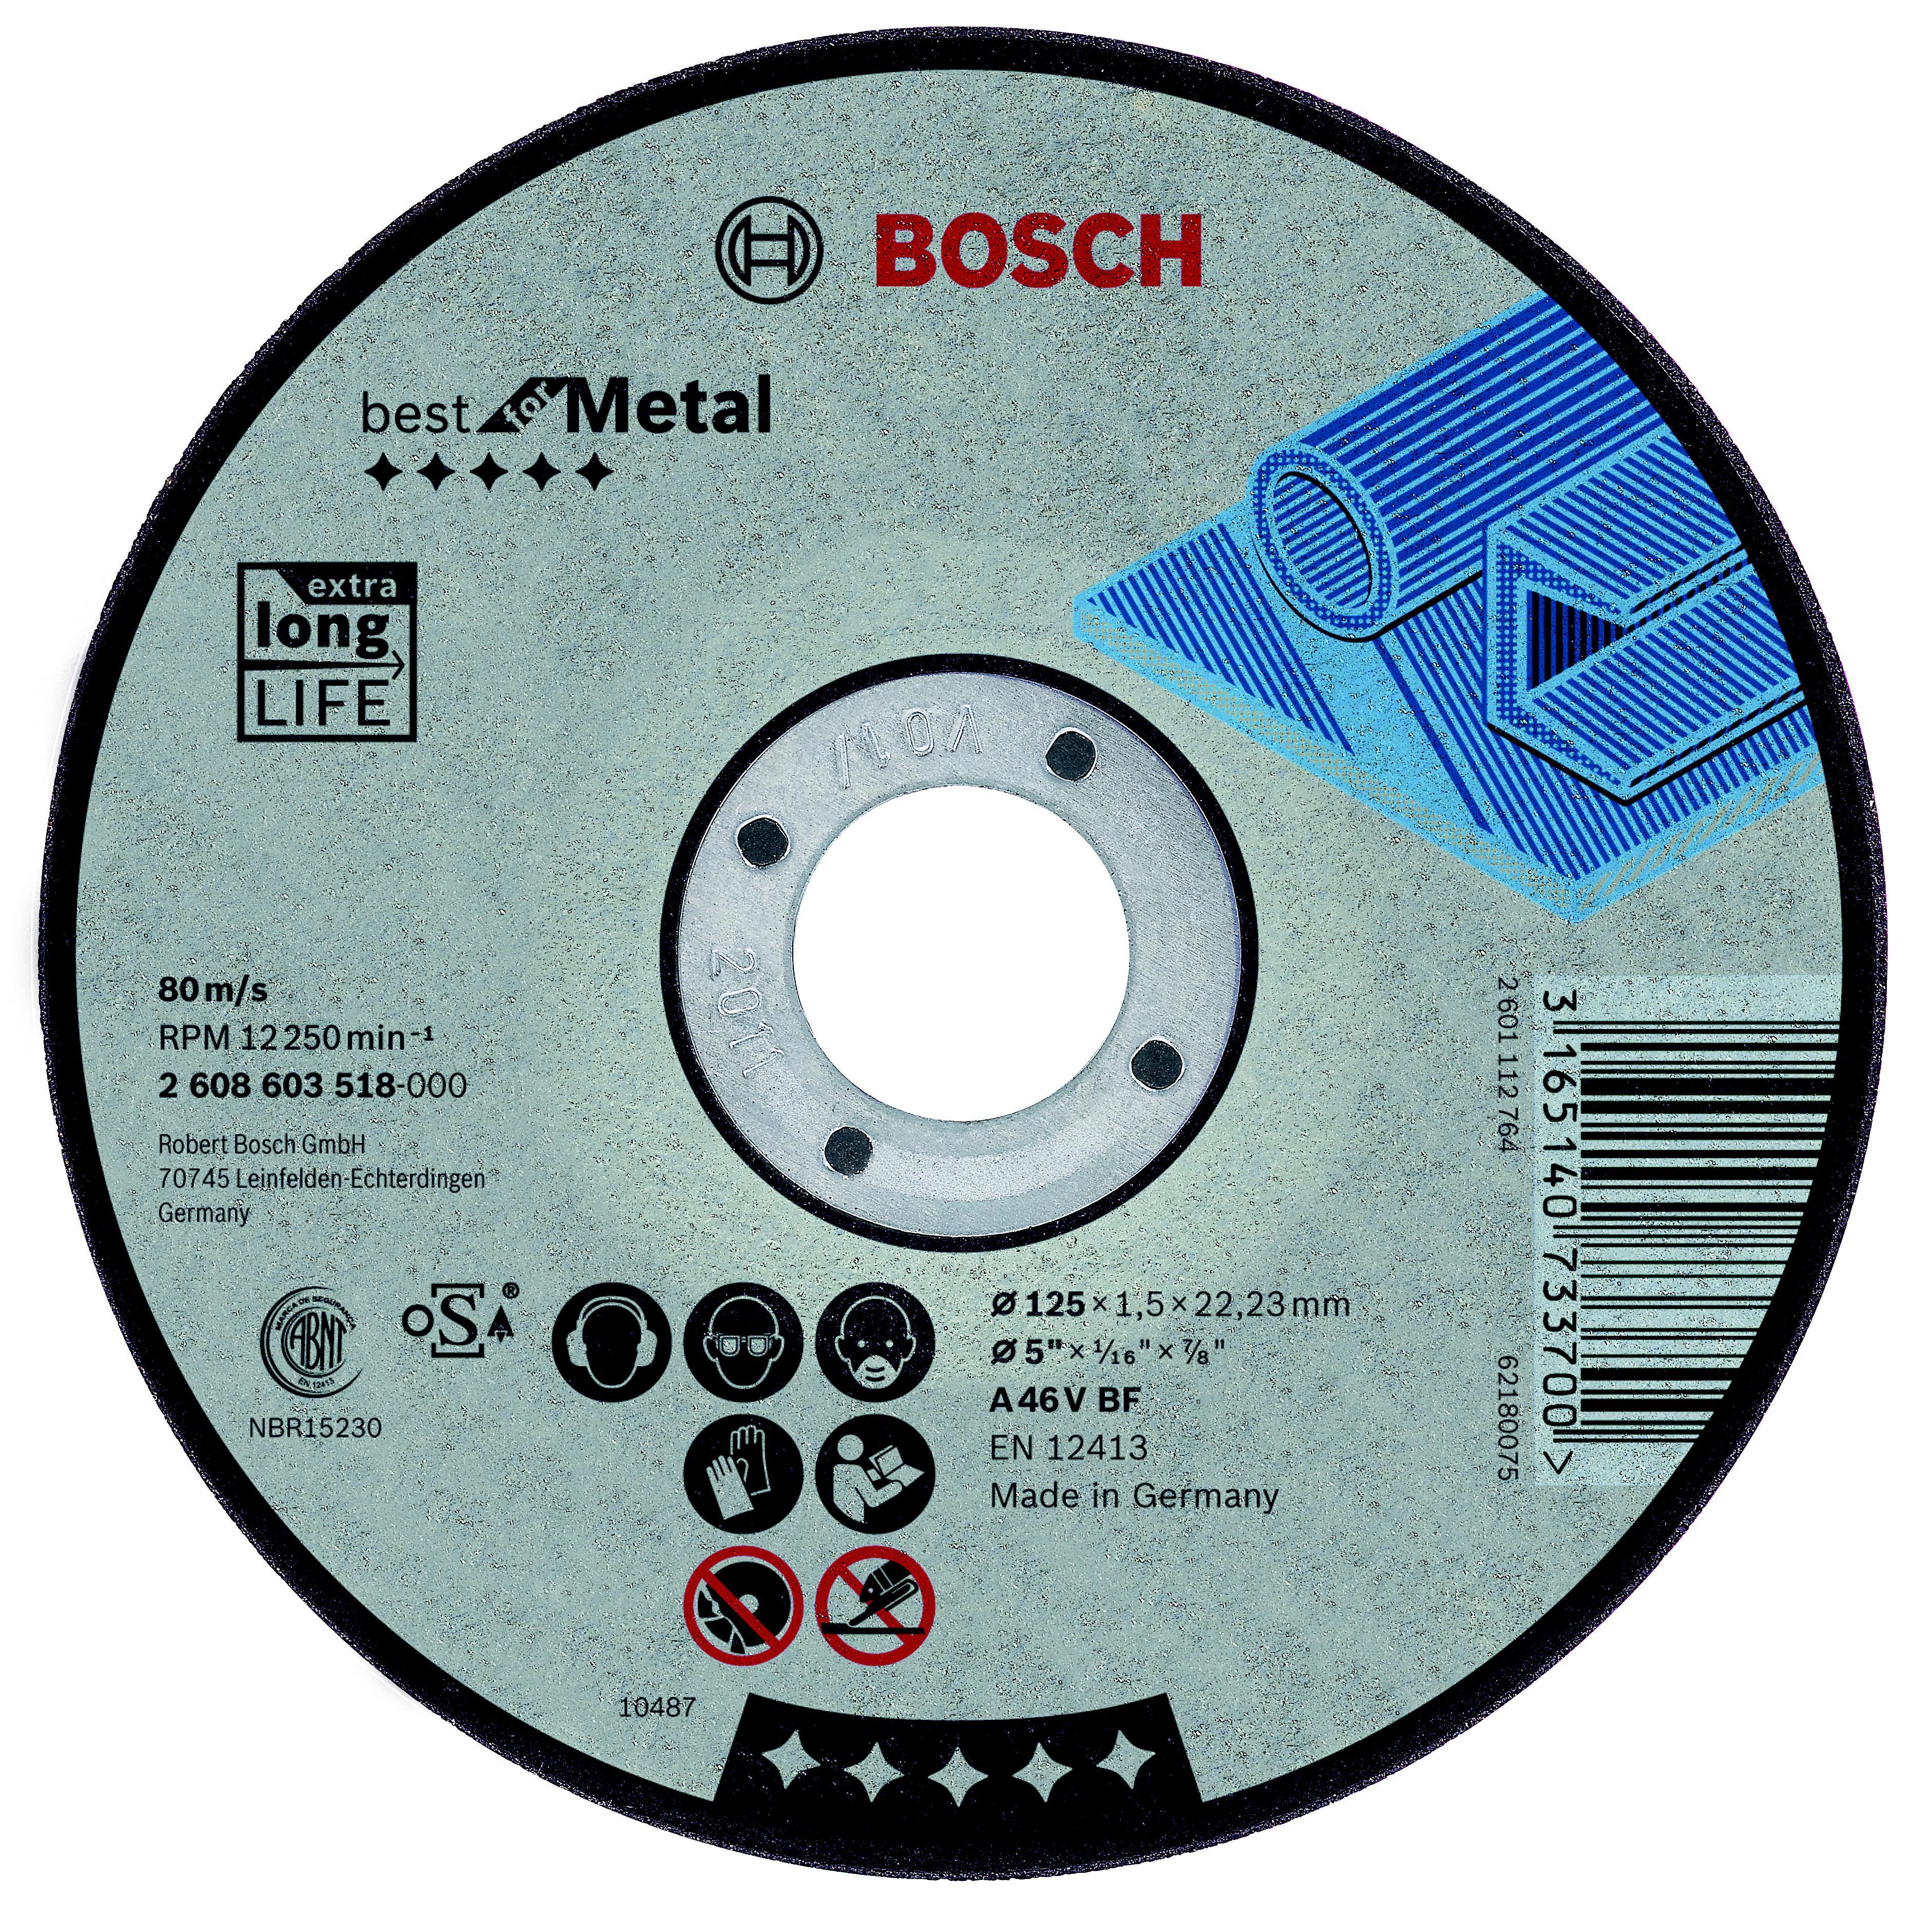 Круг отрезной Bosch 115х1.5х22 best for metal (2.608.603.517) круг отрезной bosch 115х1 5х22 best for metal 2 608 603 517